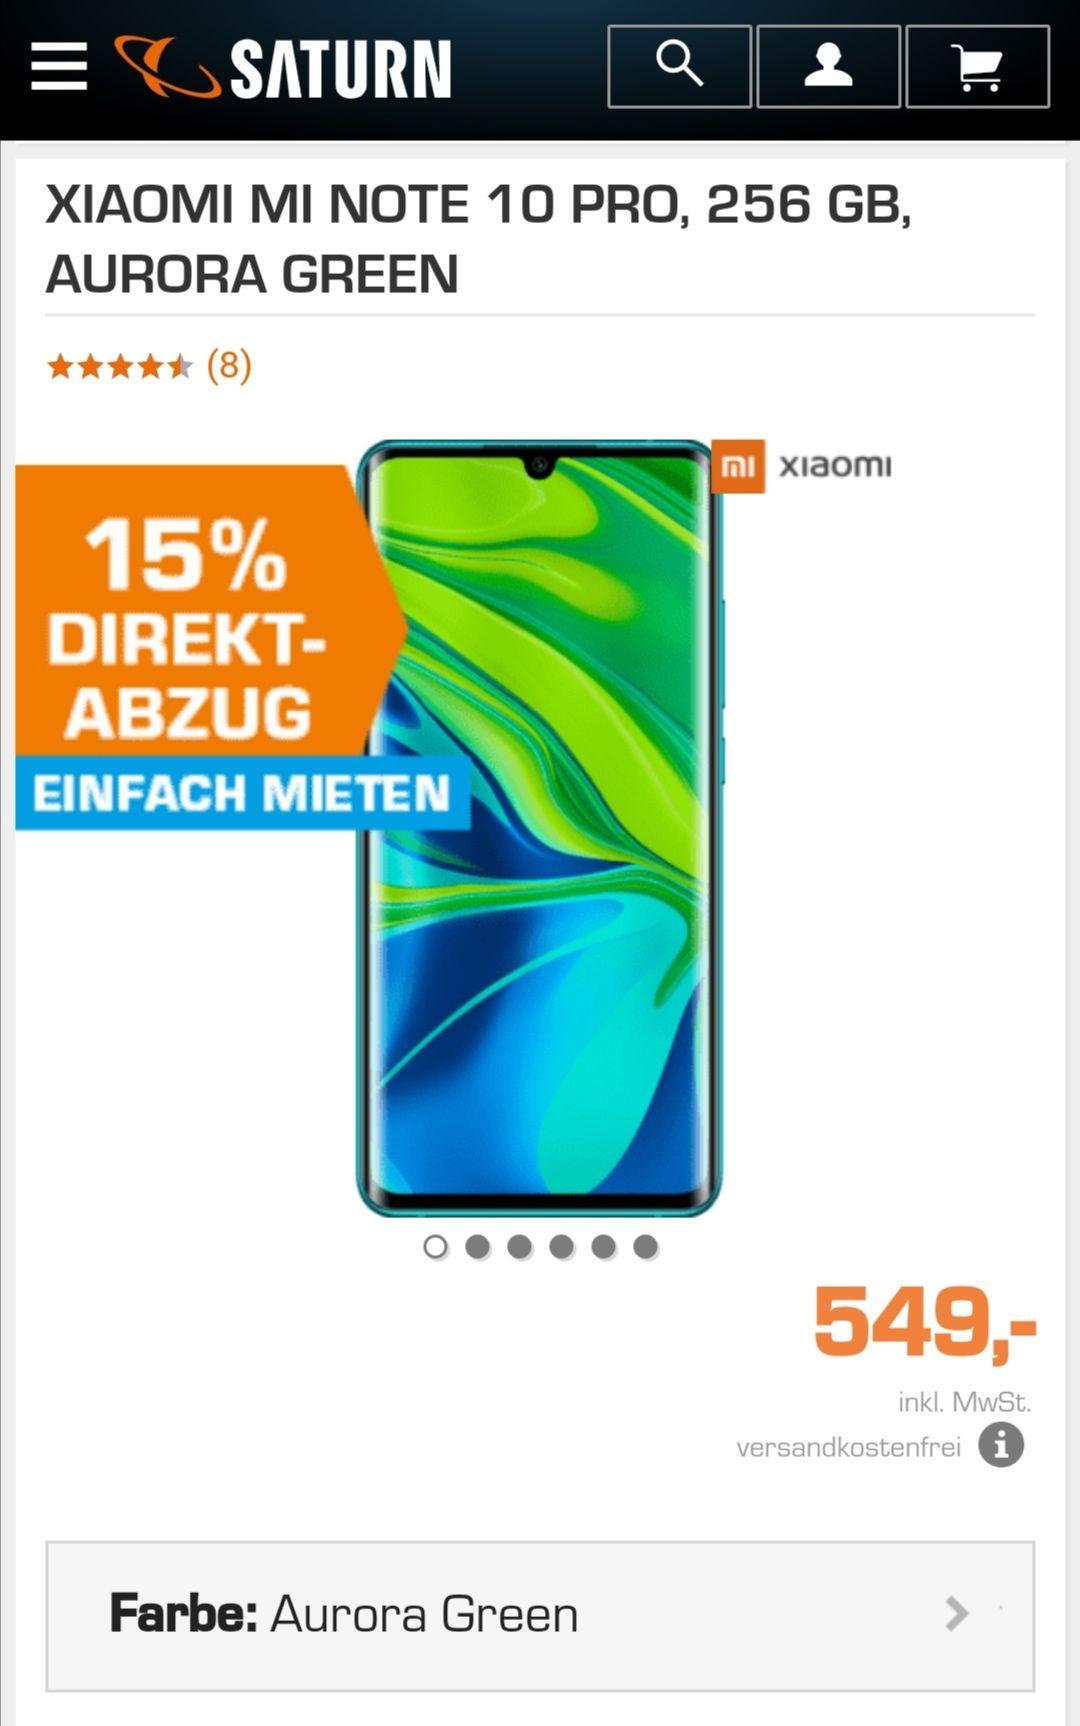 Xiaomi mi note 10 pro 15% Abzug